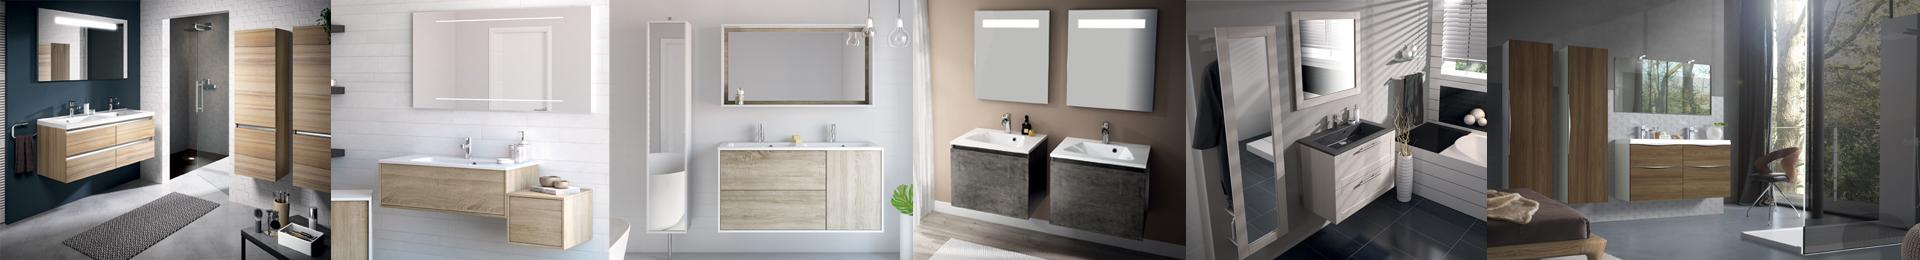 Meuble salle de bain bois mobilier en bois effet b ton cir for Mobilier salle de bain bois